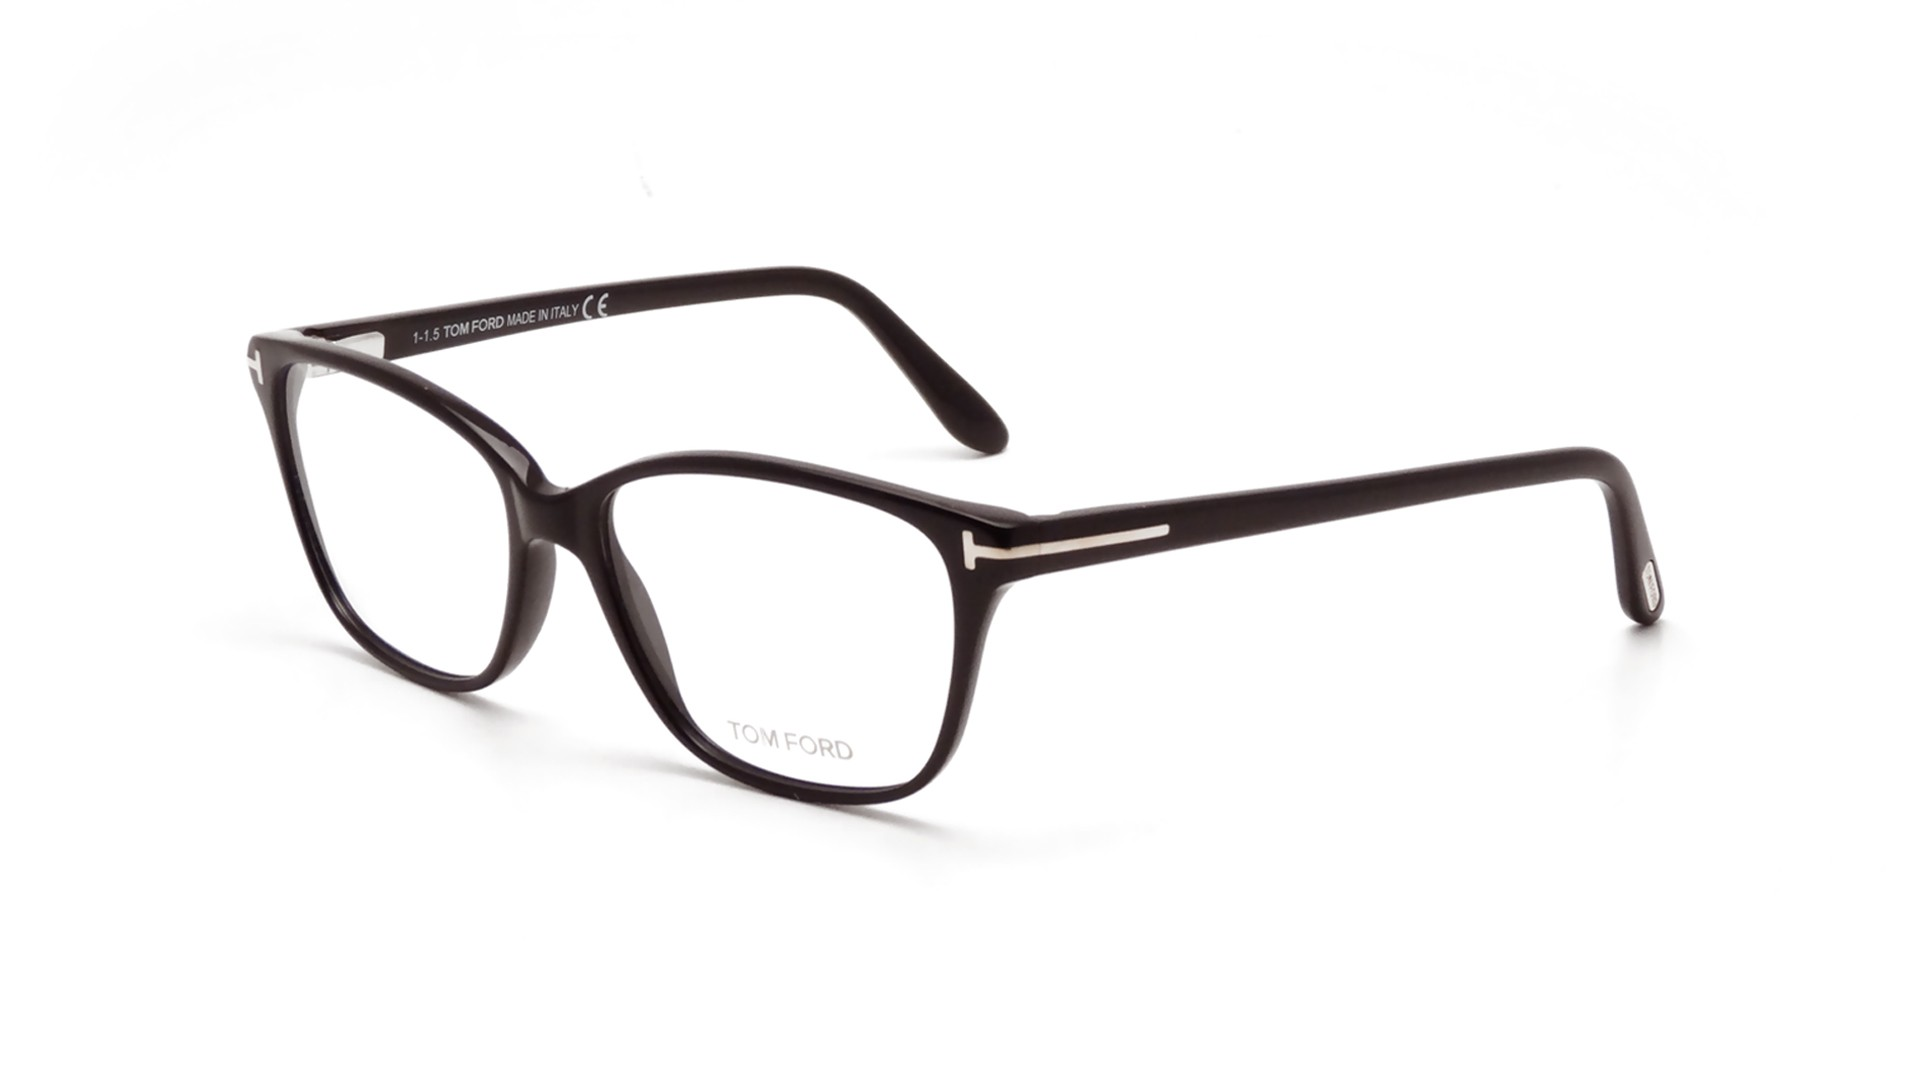 d15adffae47e Eyeglasses Tom Ford FT5293 001 54-15 Black Medium